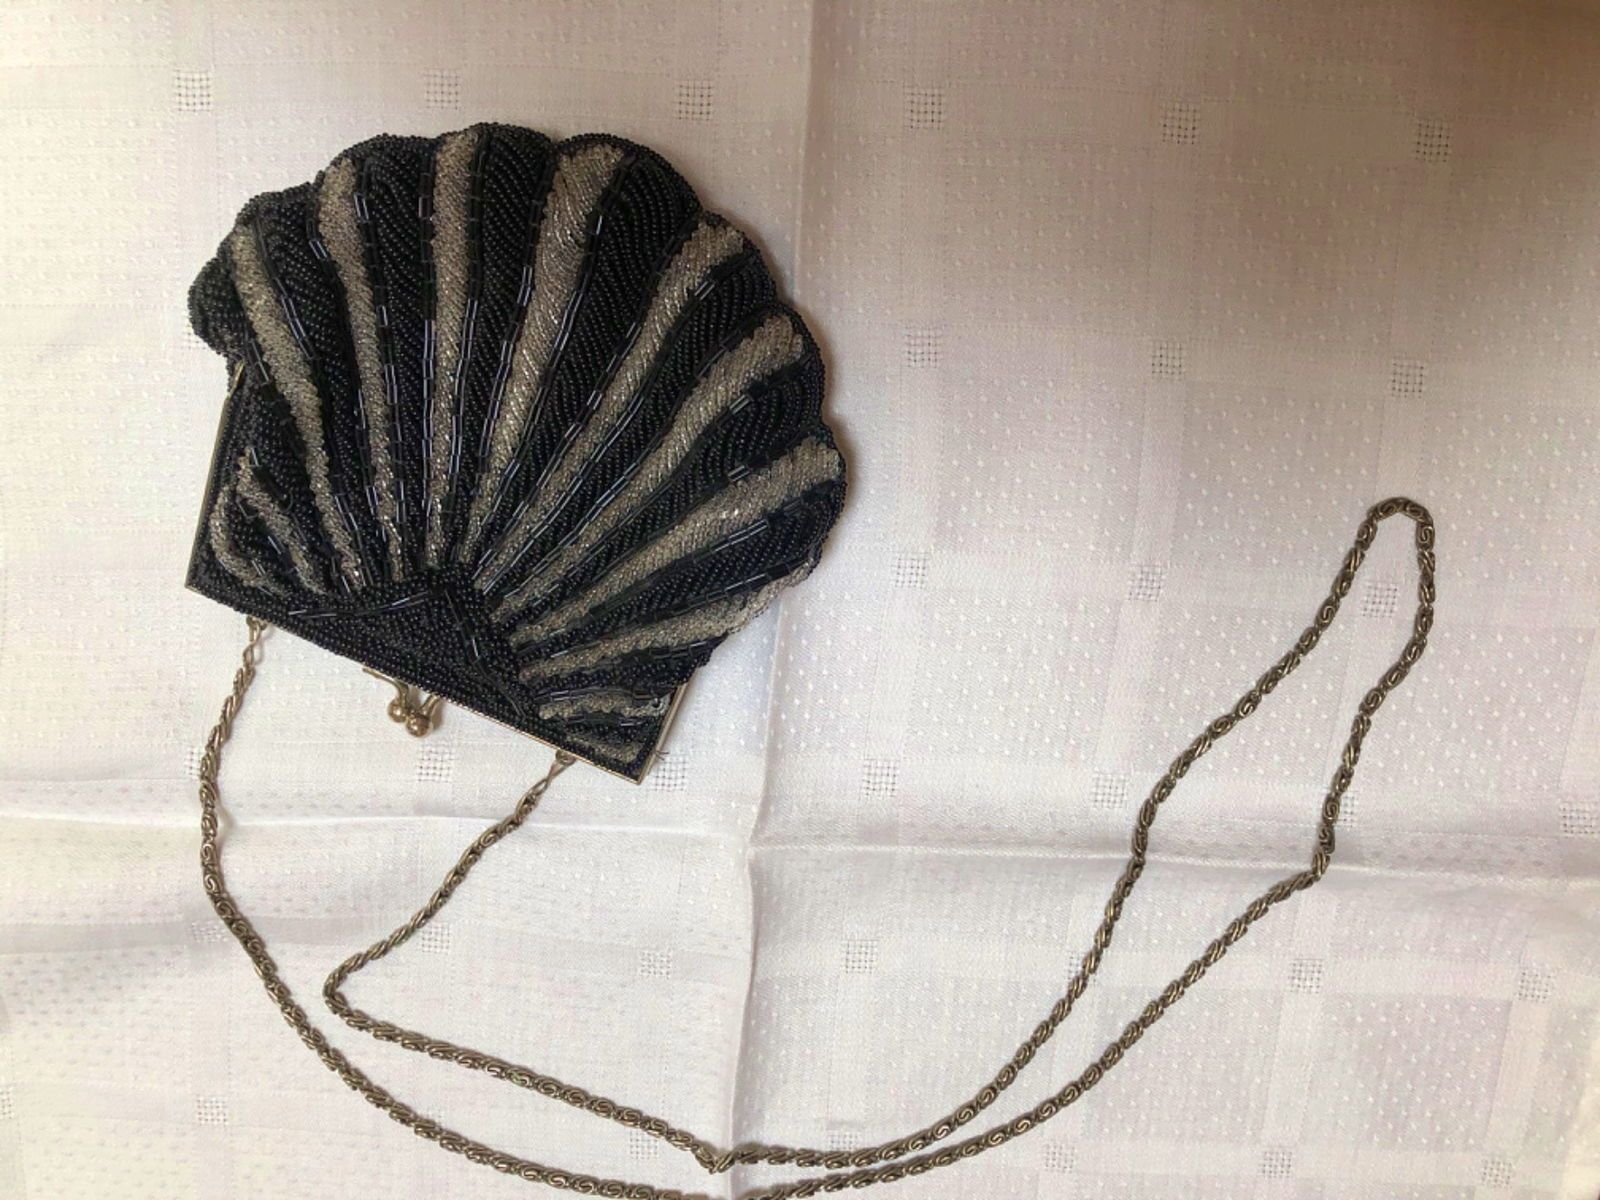 Joli sac/ bourse/ minaudière en perles vintage